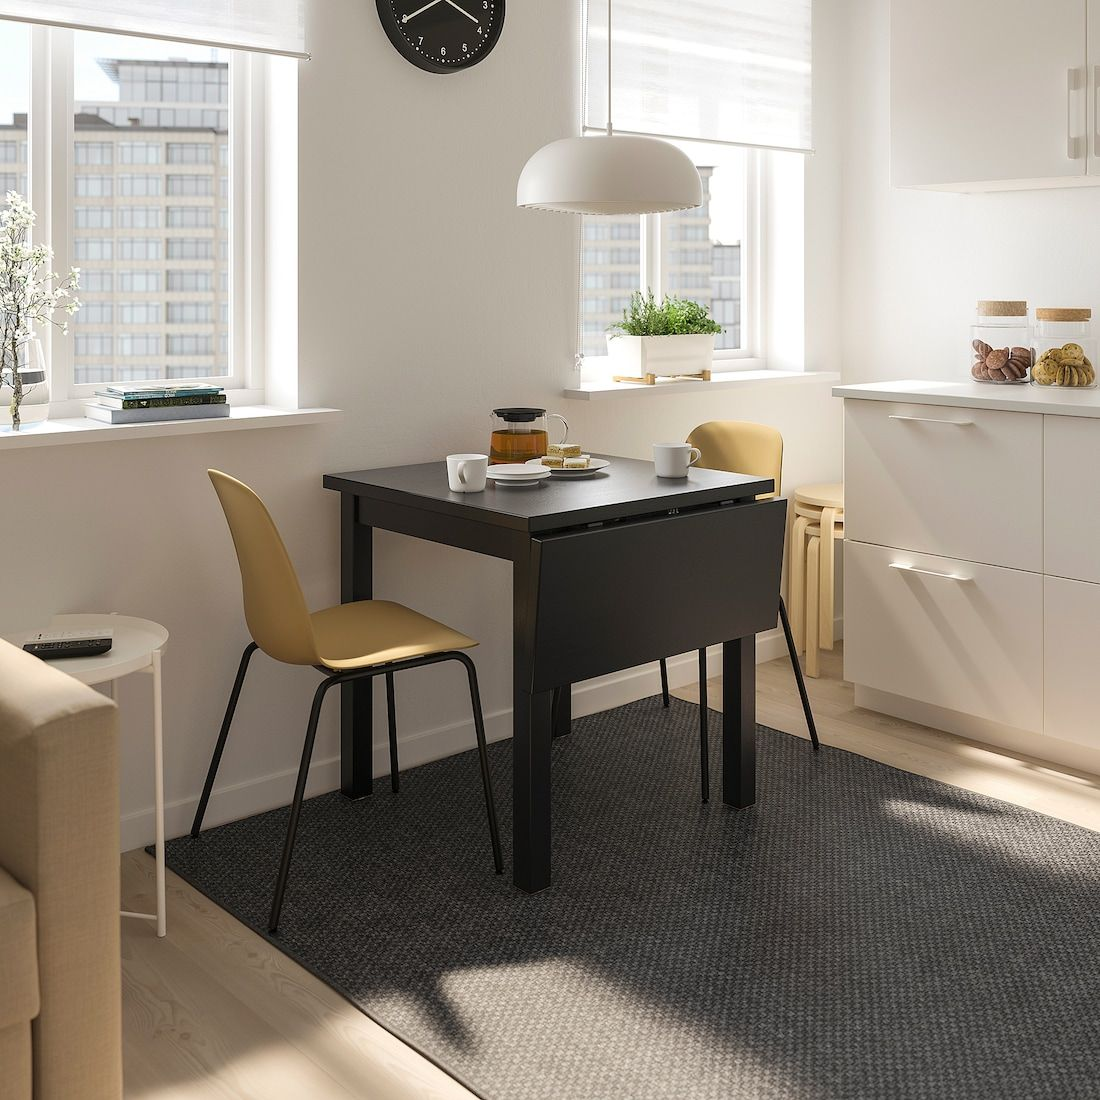 IKEA NORDVIKEN / LEIFARNE Black, Broringe Black Table and